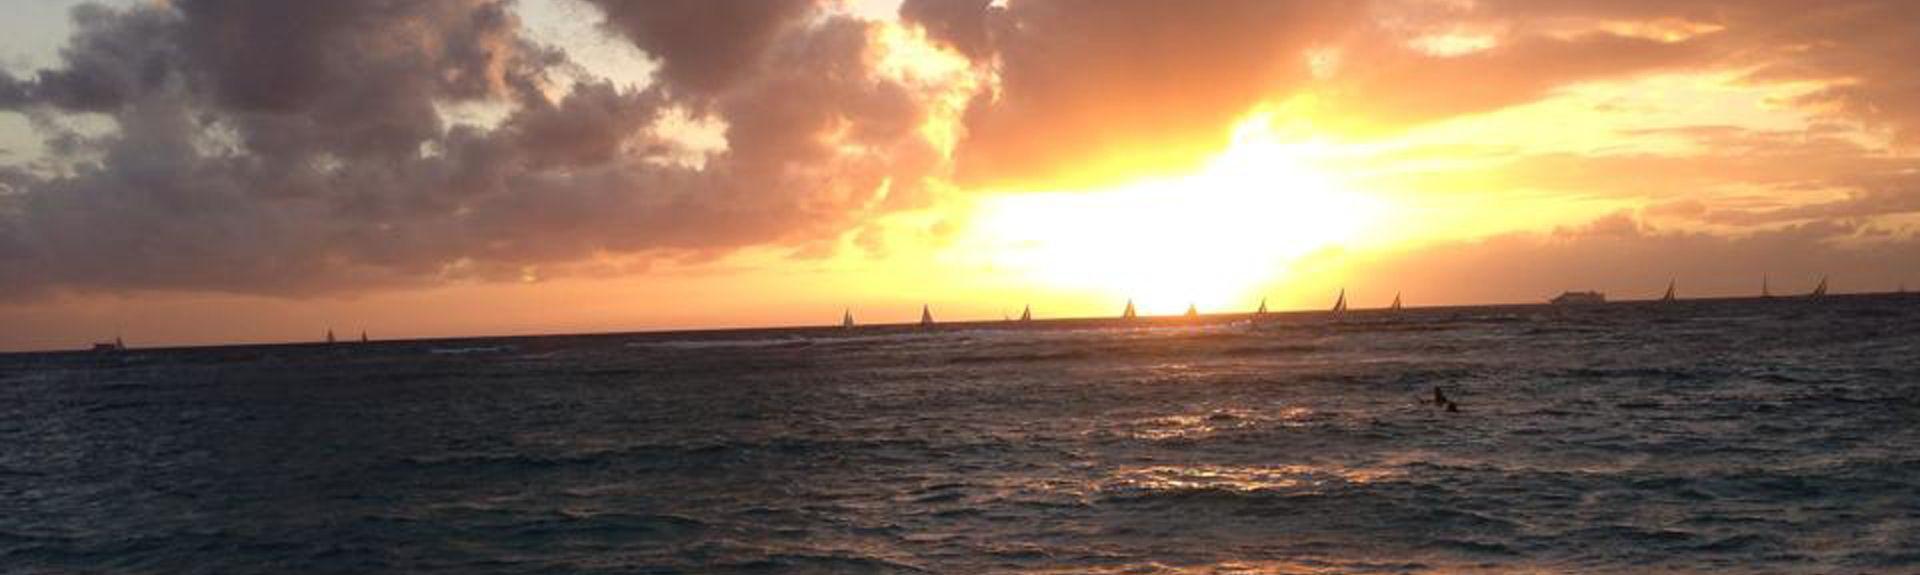 Nuuanu - Punchbowl, Honolulu, Hawaï, États-Unis d'Amérique